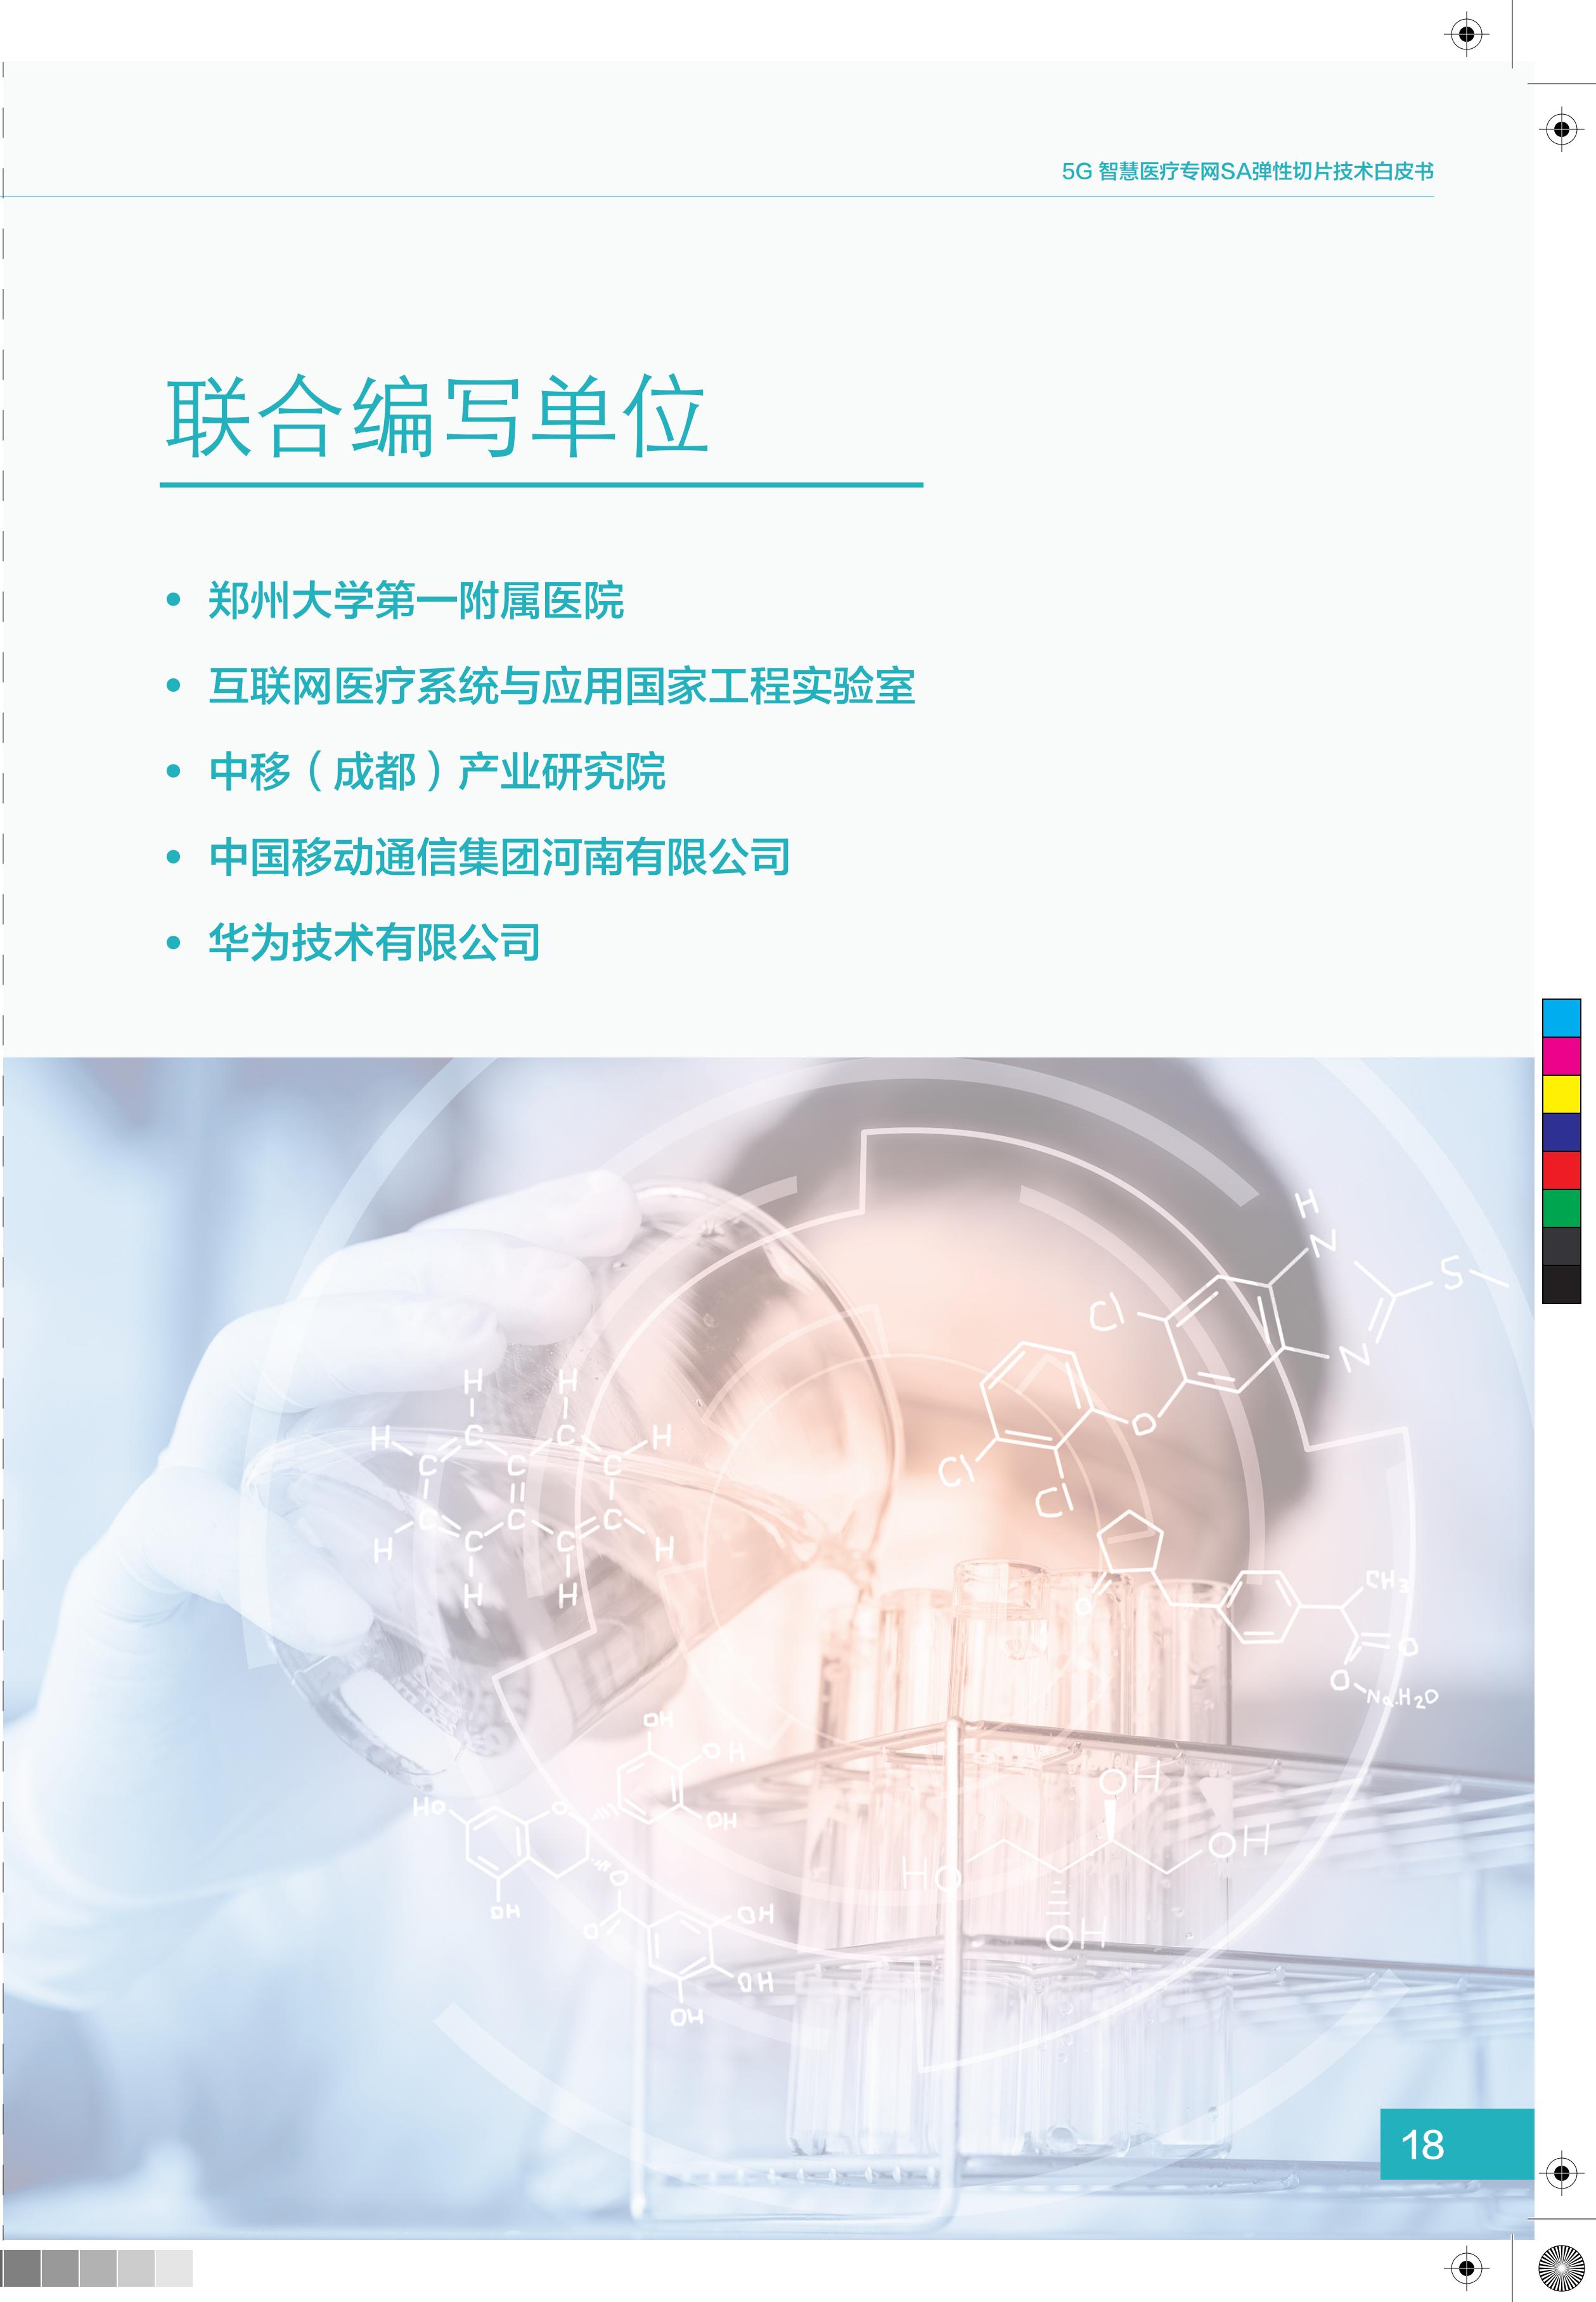 5G智慧医疗专网SA弹性切片技术白皮书_10.png